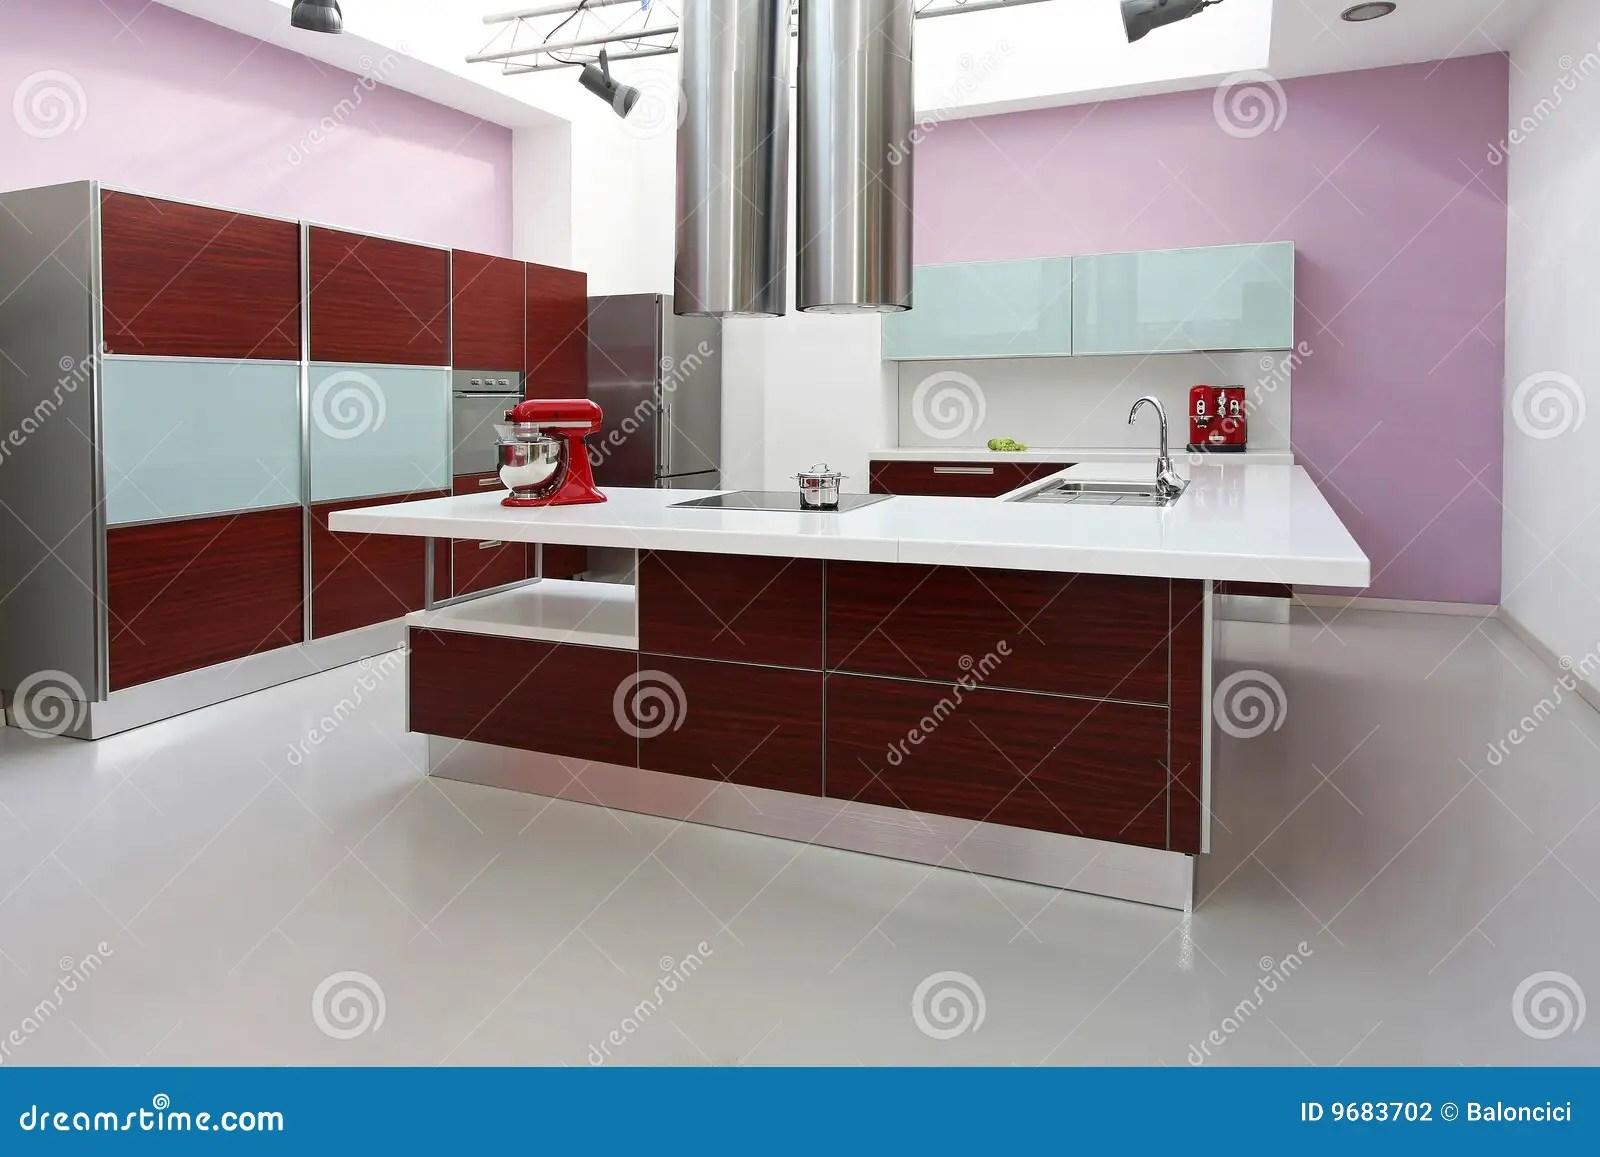 framed prints for kitchens kitchen flooring types 内部厨房紫色库存照片 图片包括有机柜 设备 紫色 厨房 样式 透气 内部厨房紫色